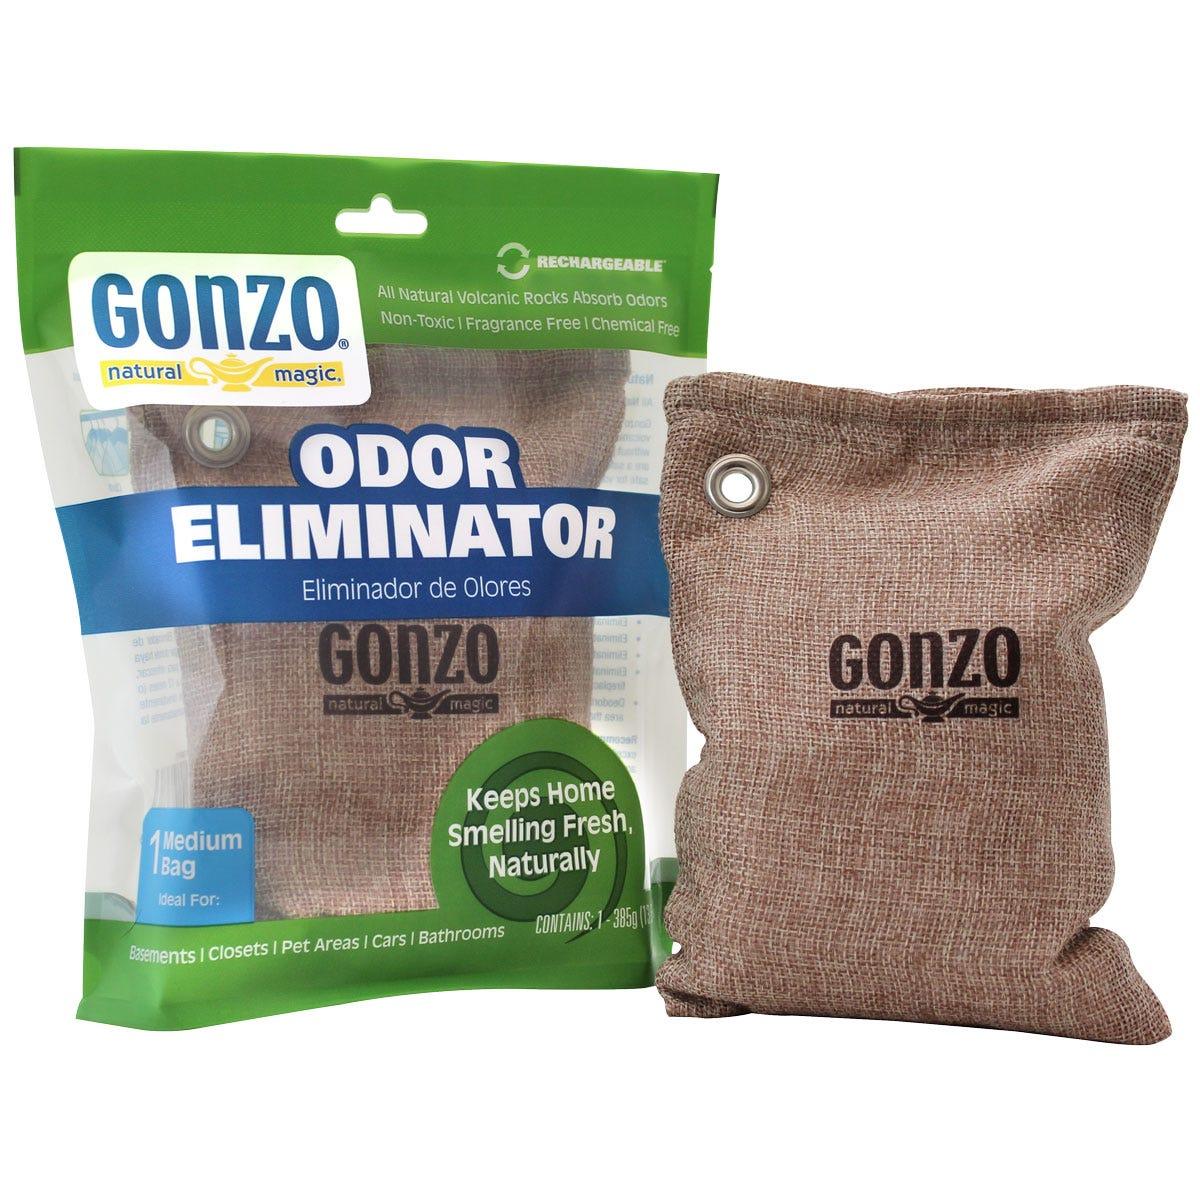 https://googone.com/media/catalog/product/d/e/decorative-odor-eliminator_burlap_1_6.jpg